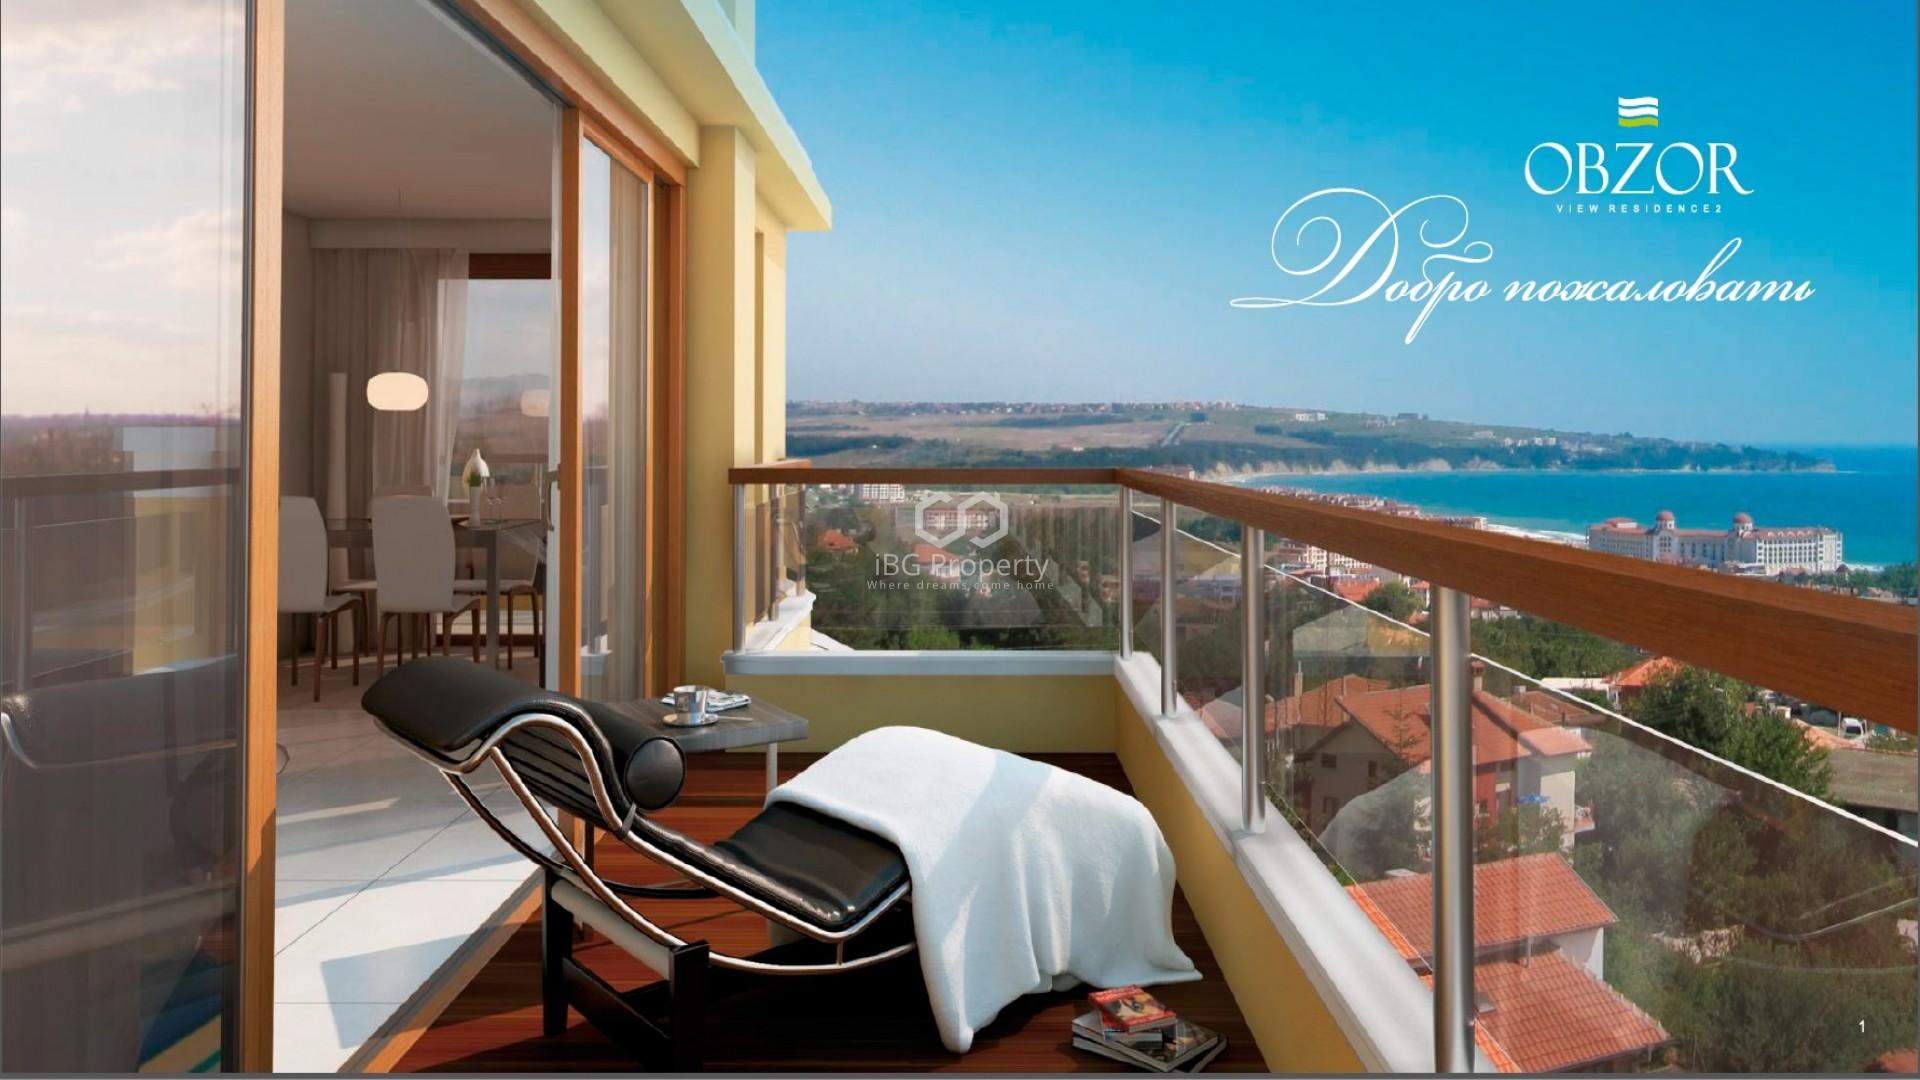 One bedroom apartment Obzor 141 m2